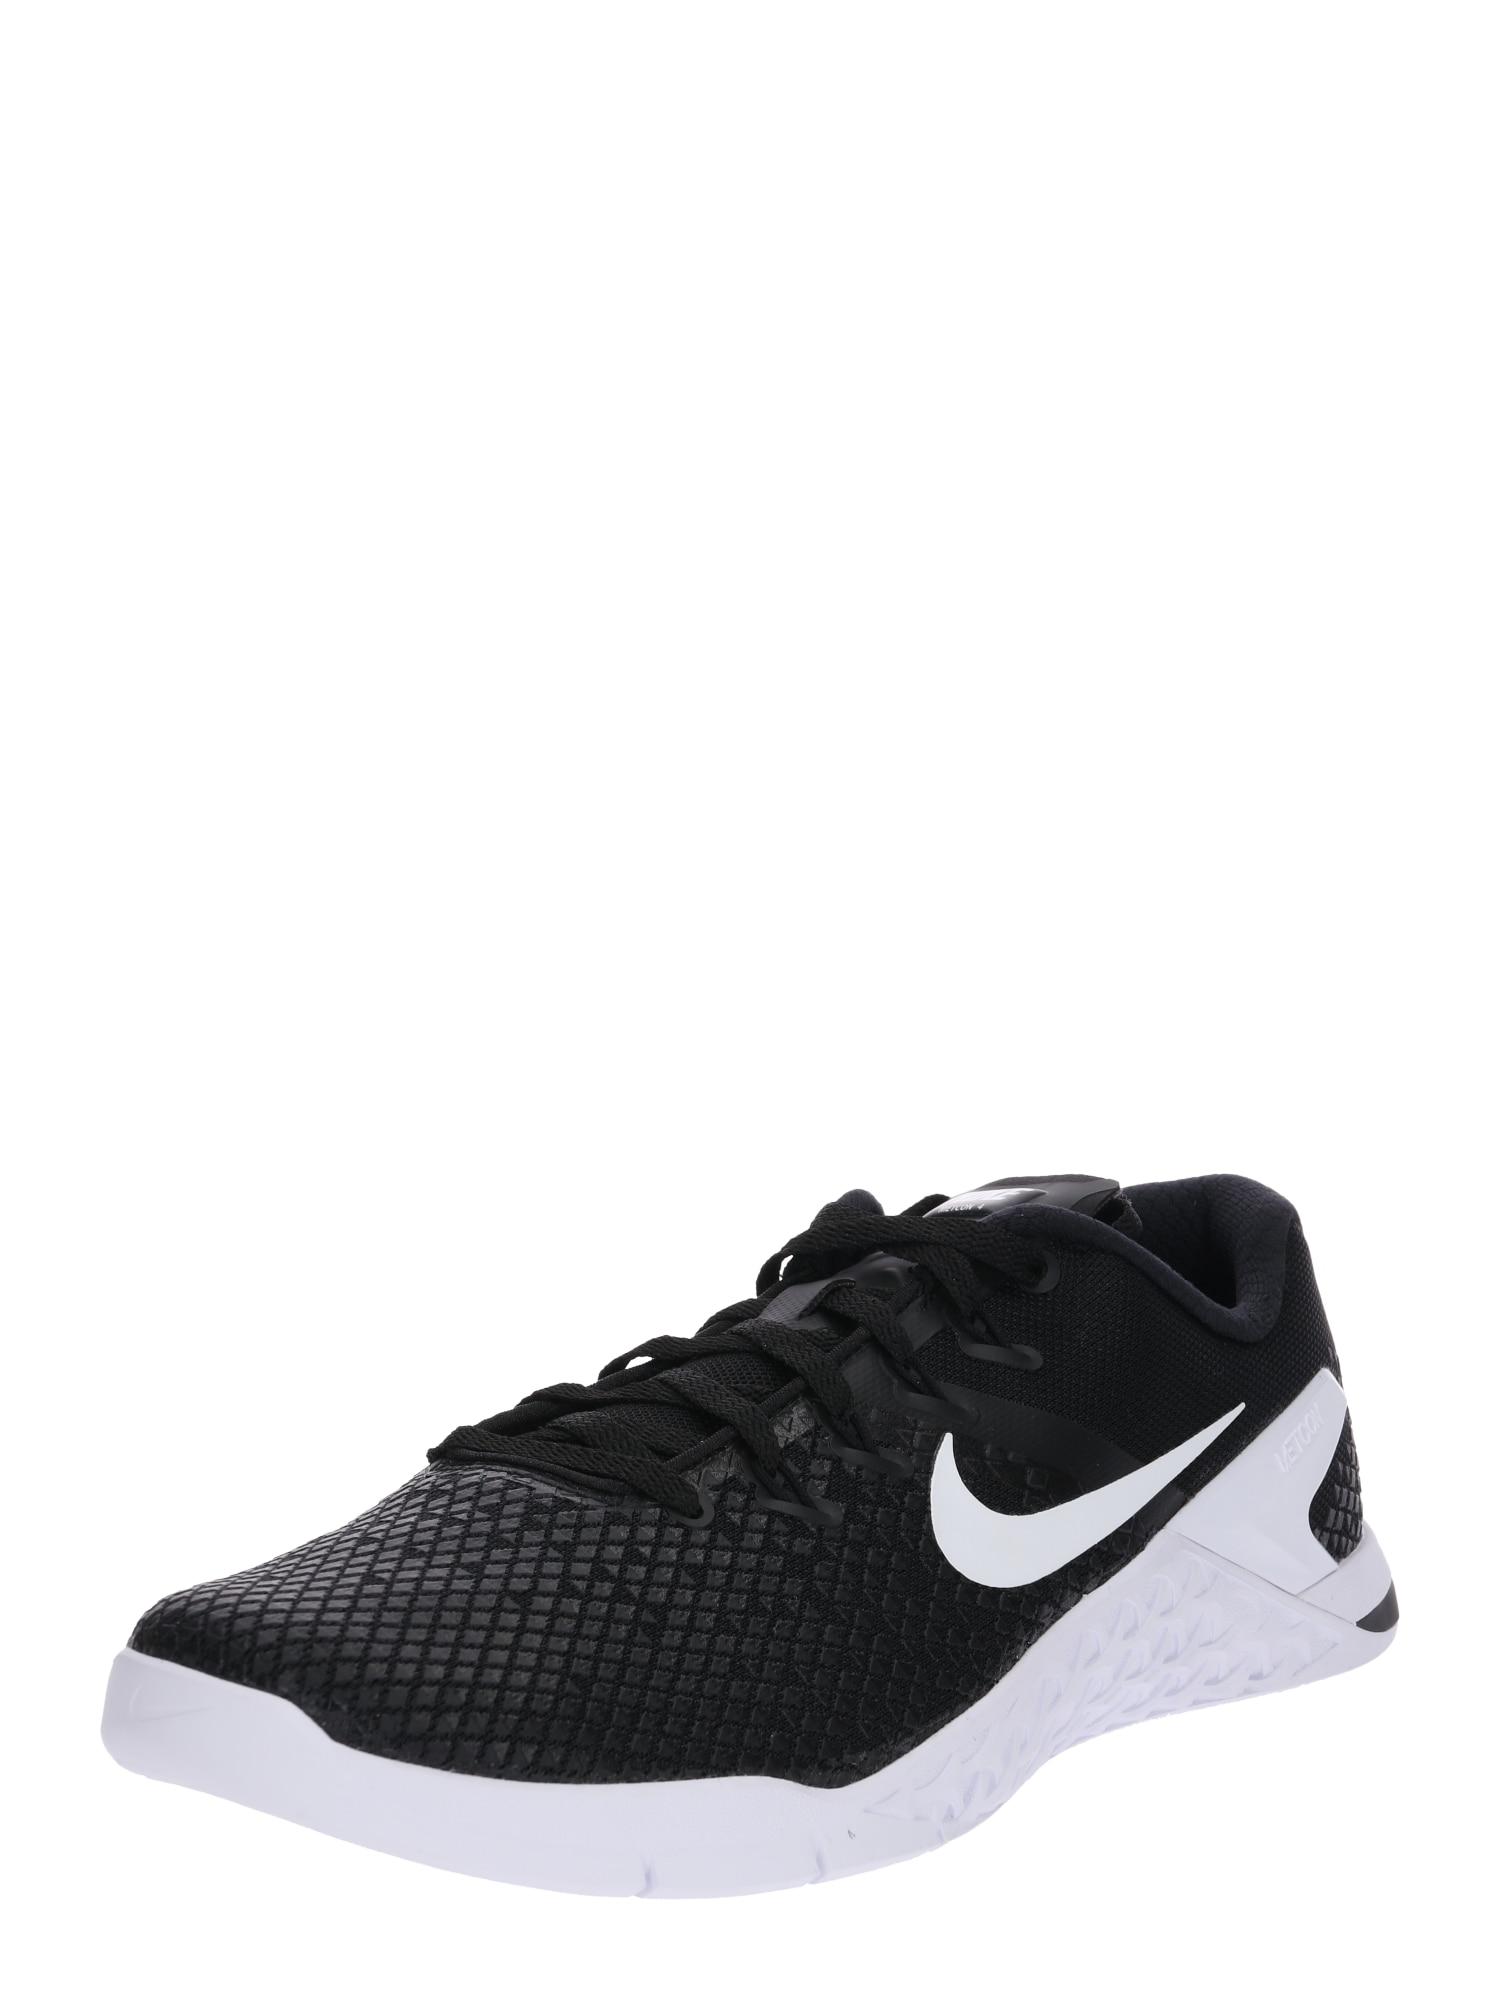 Sportovní boty Metcon 4 XD černá bílá NIKE